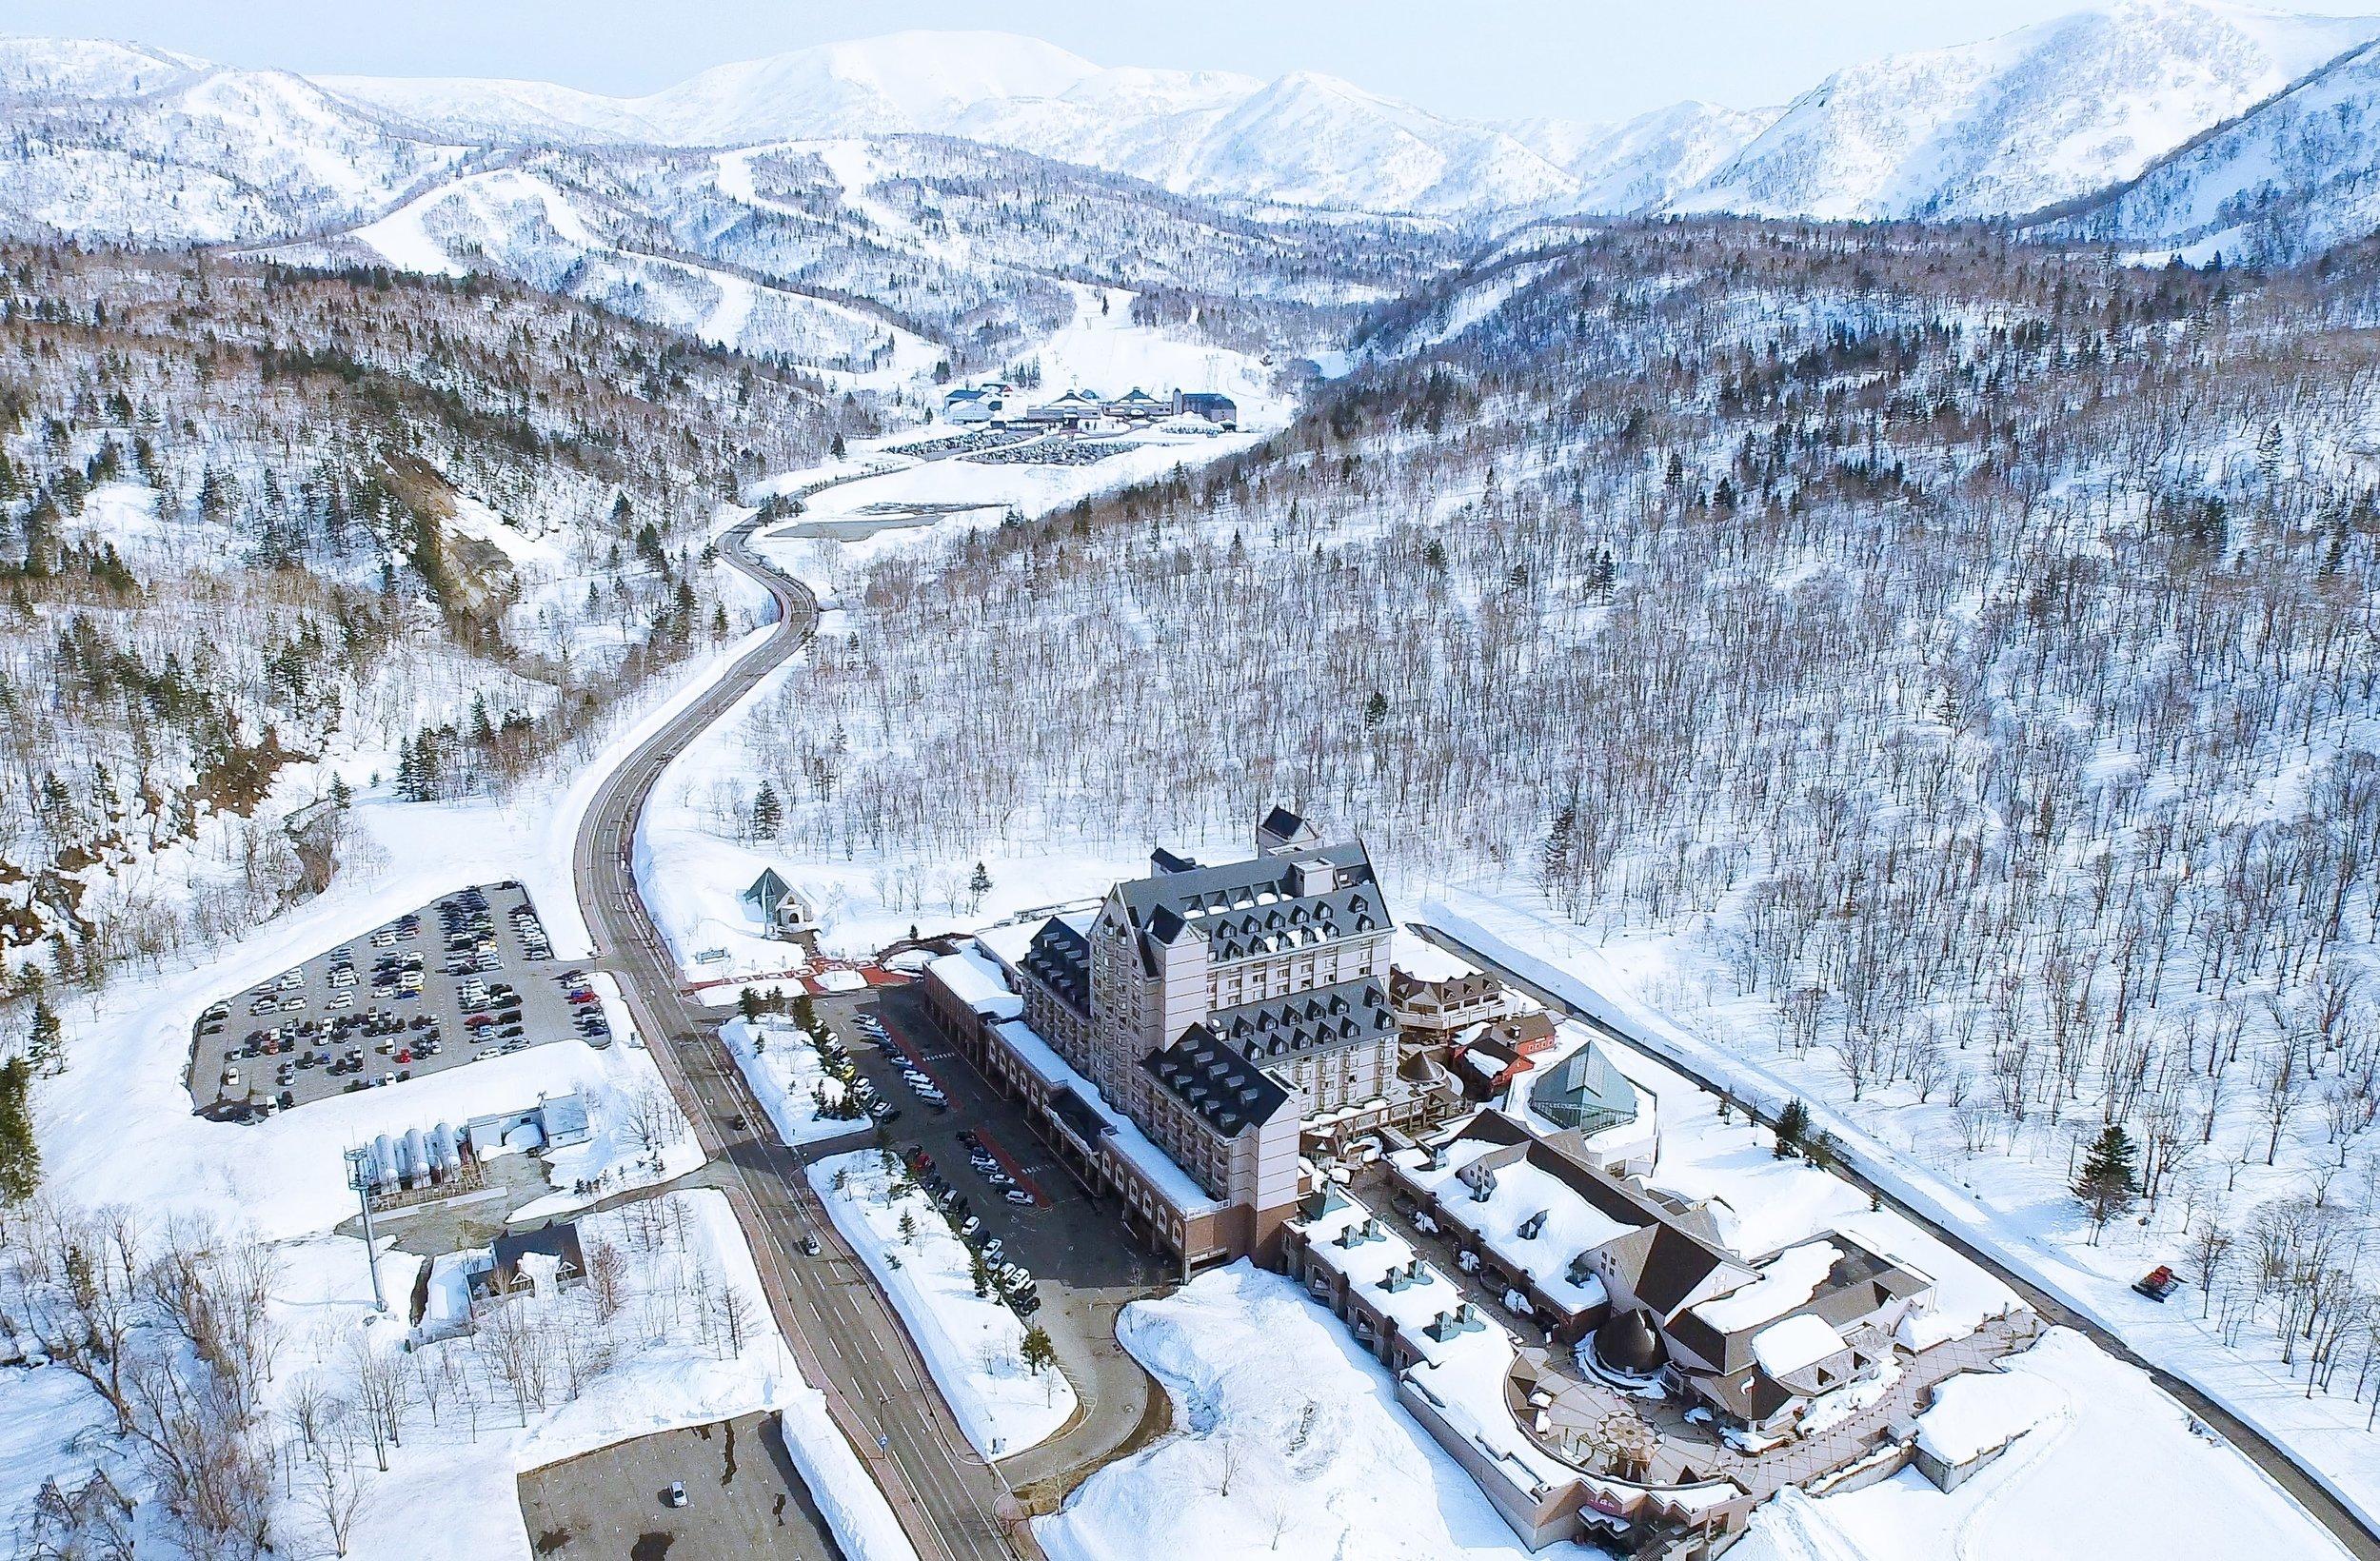 Drone_snow.jpg